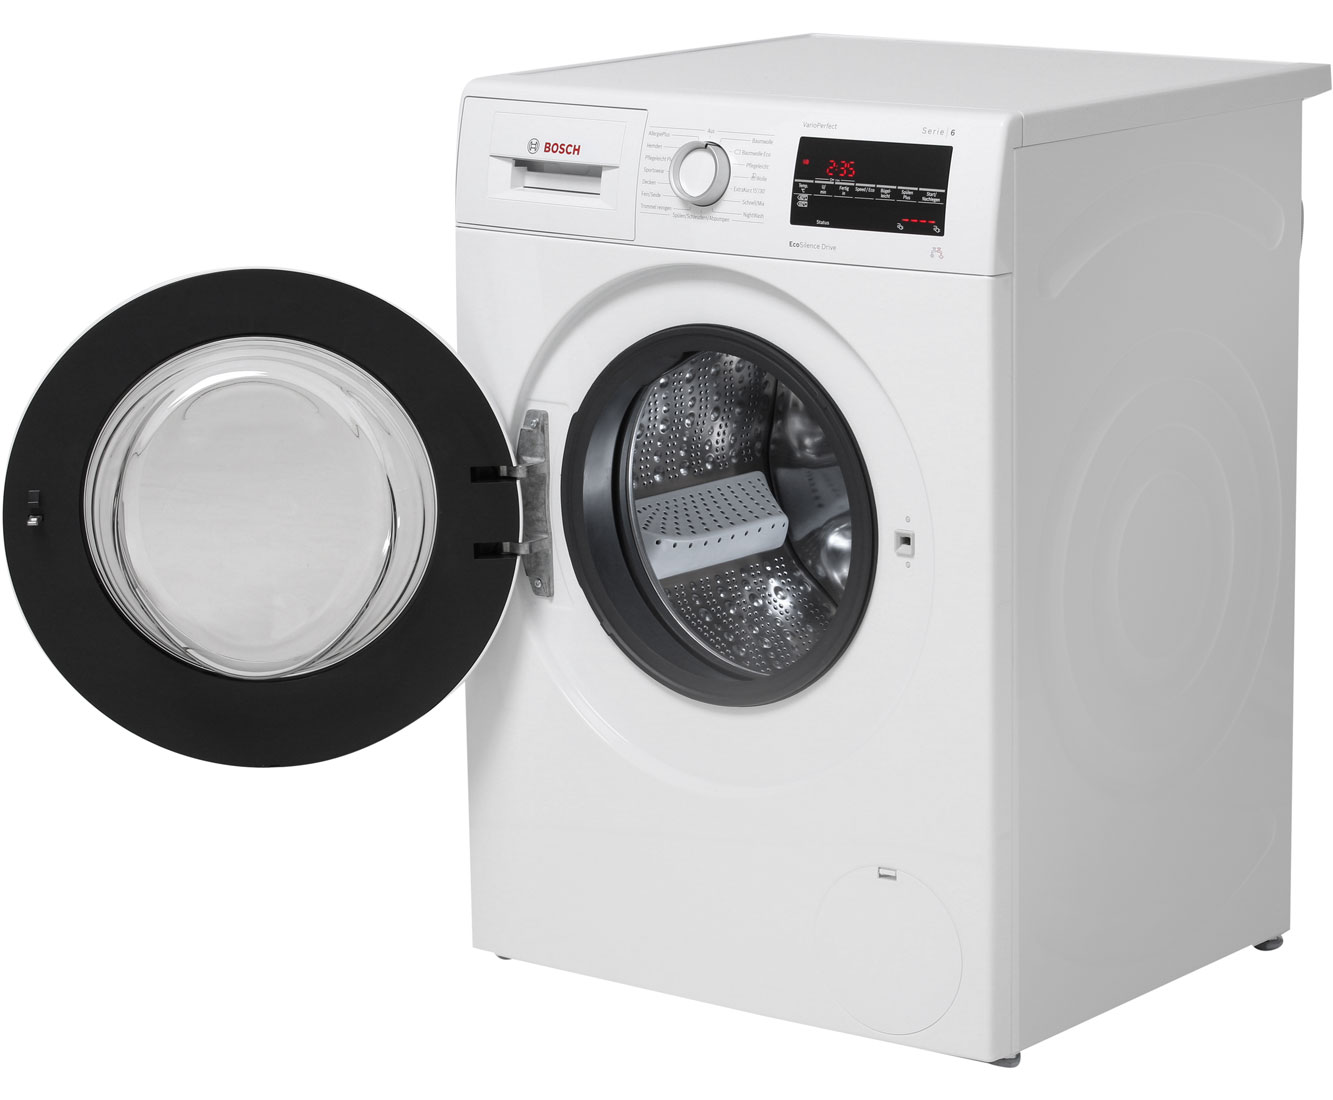 Waschmaschine Wäscht Kalt